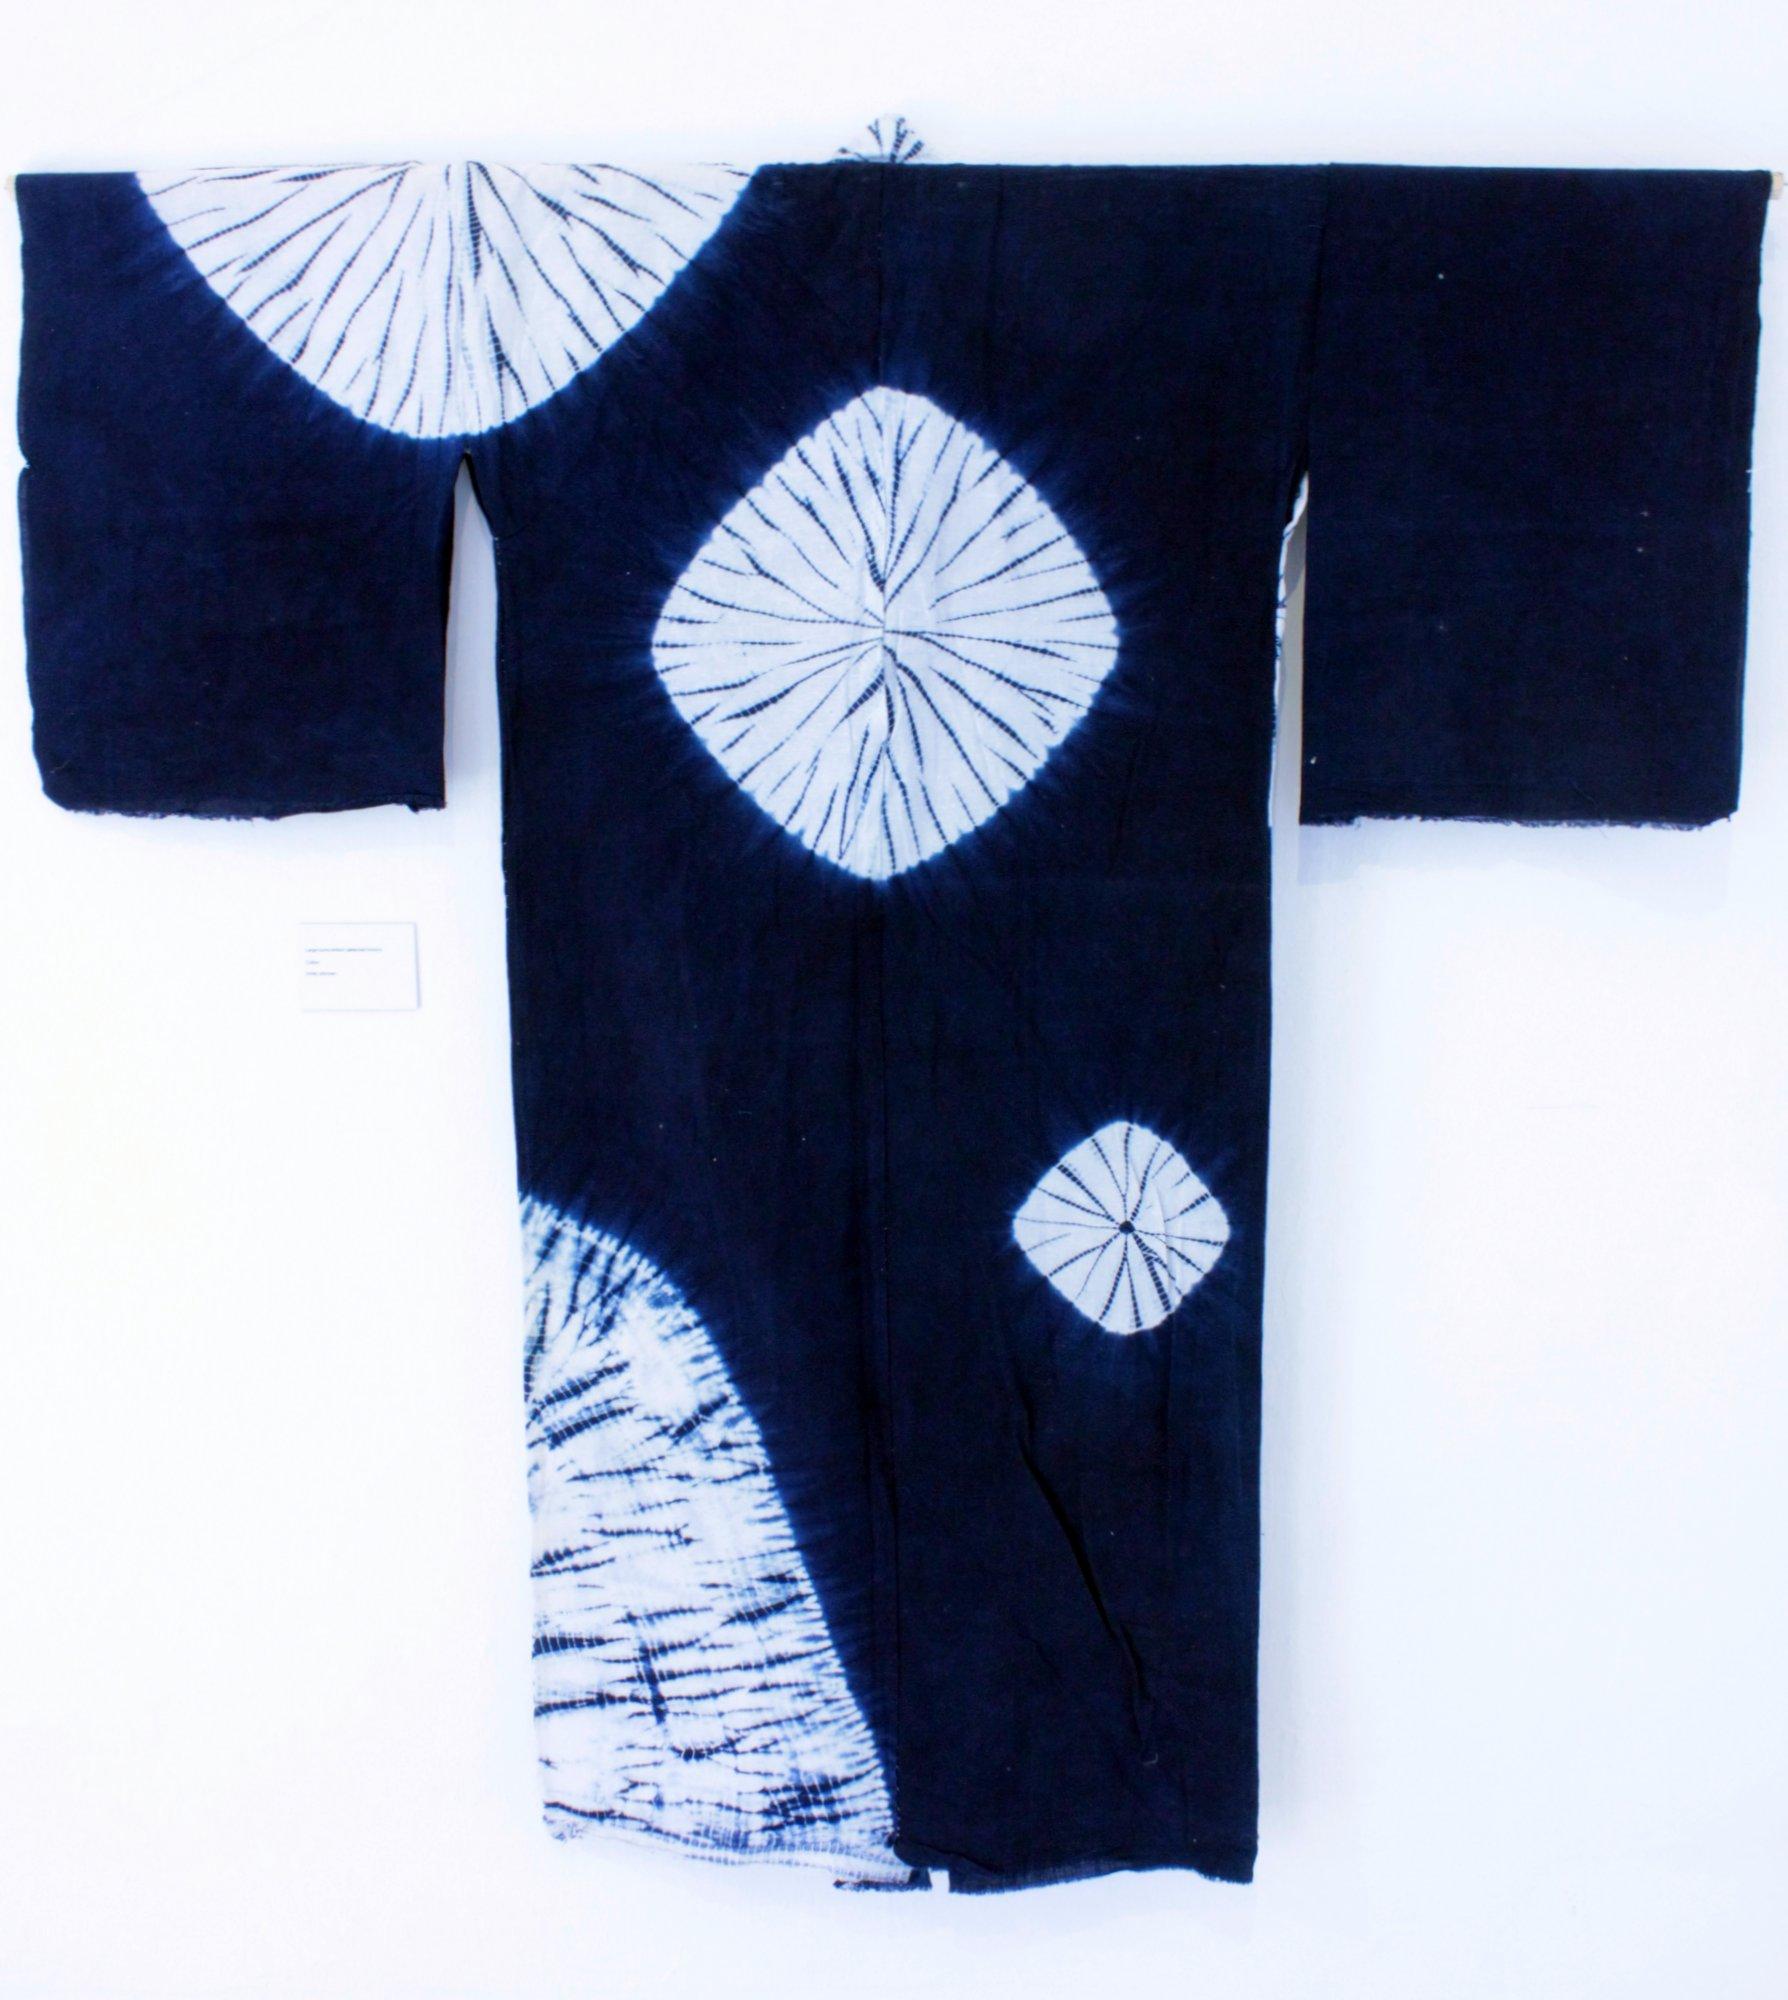 One of the beautiful hand-dyed shibori kimonos on display inside the folly.